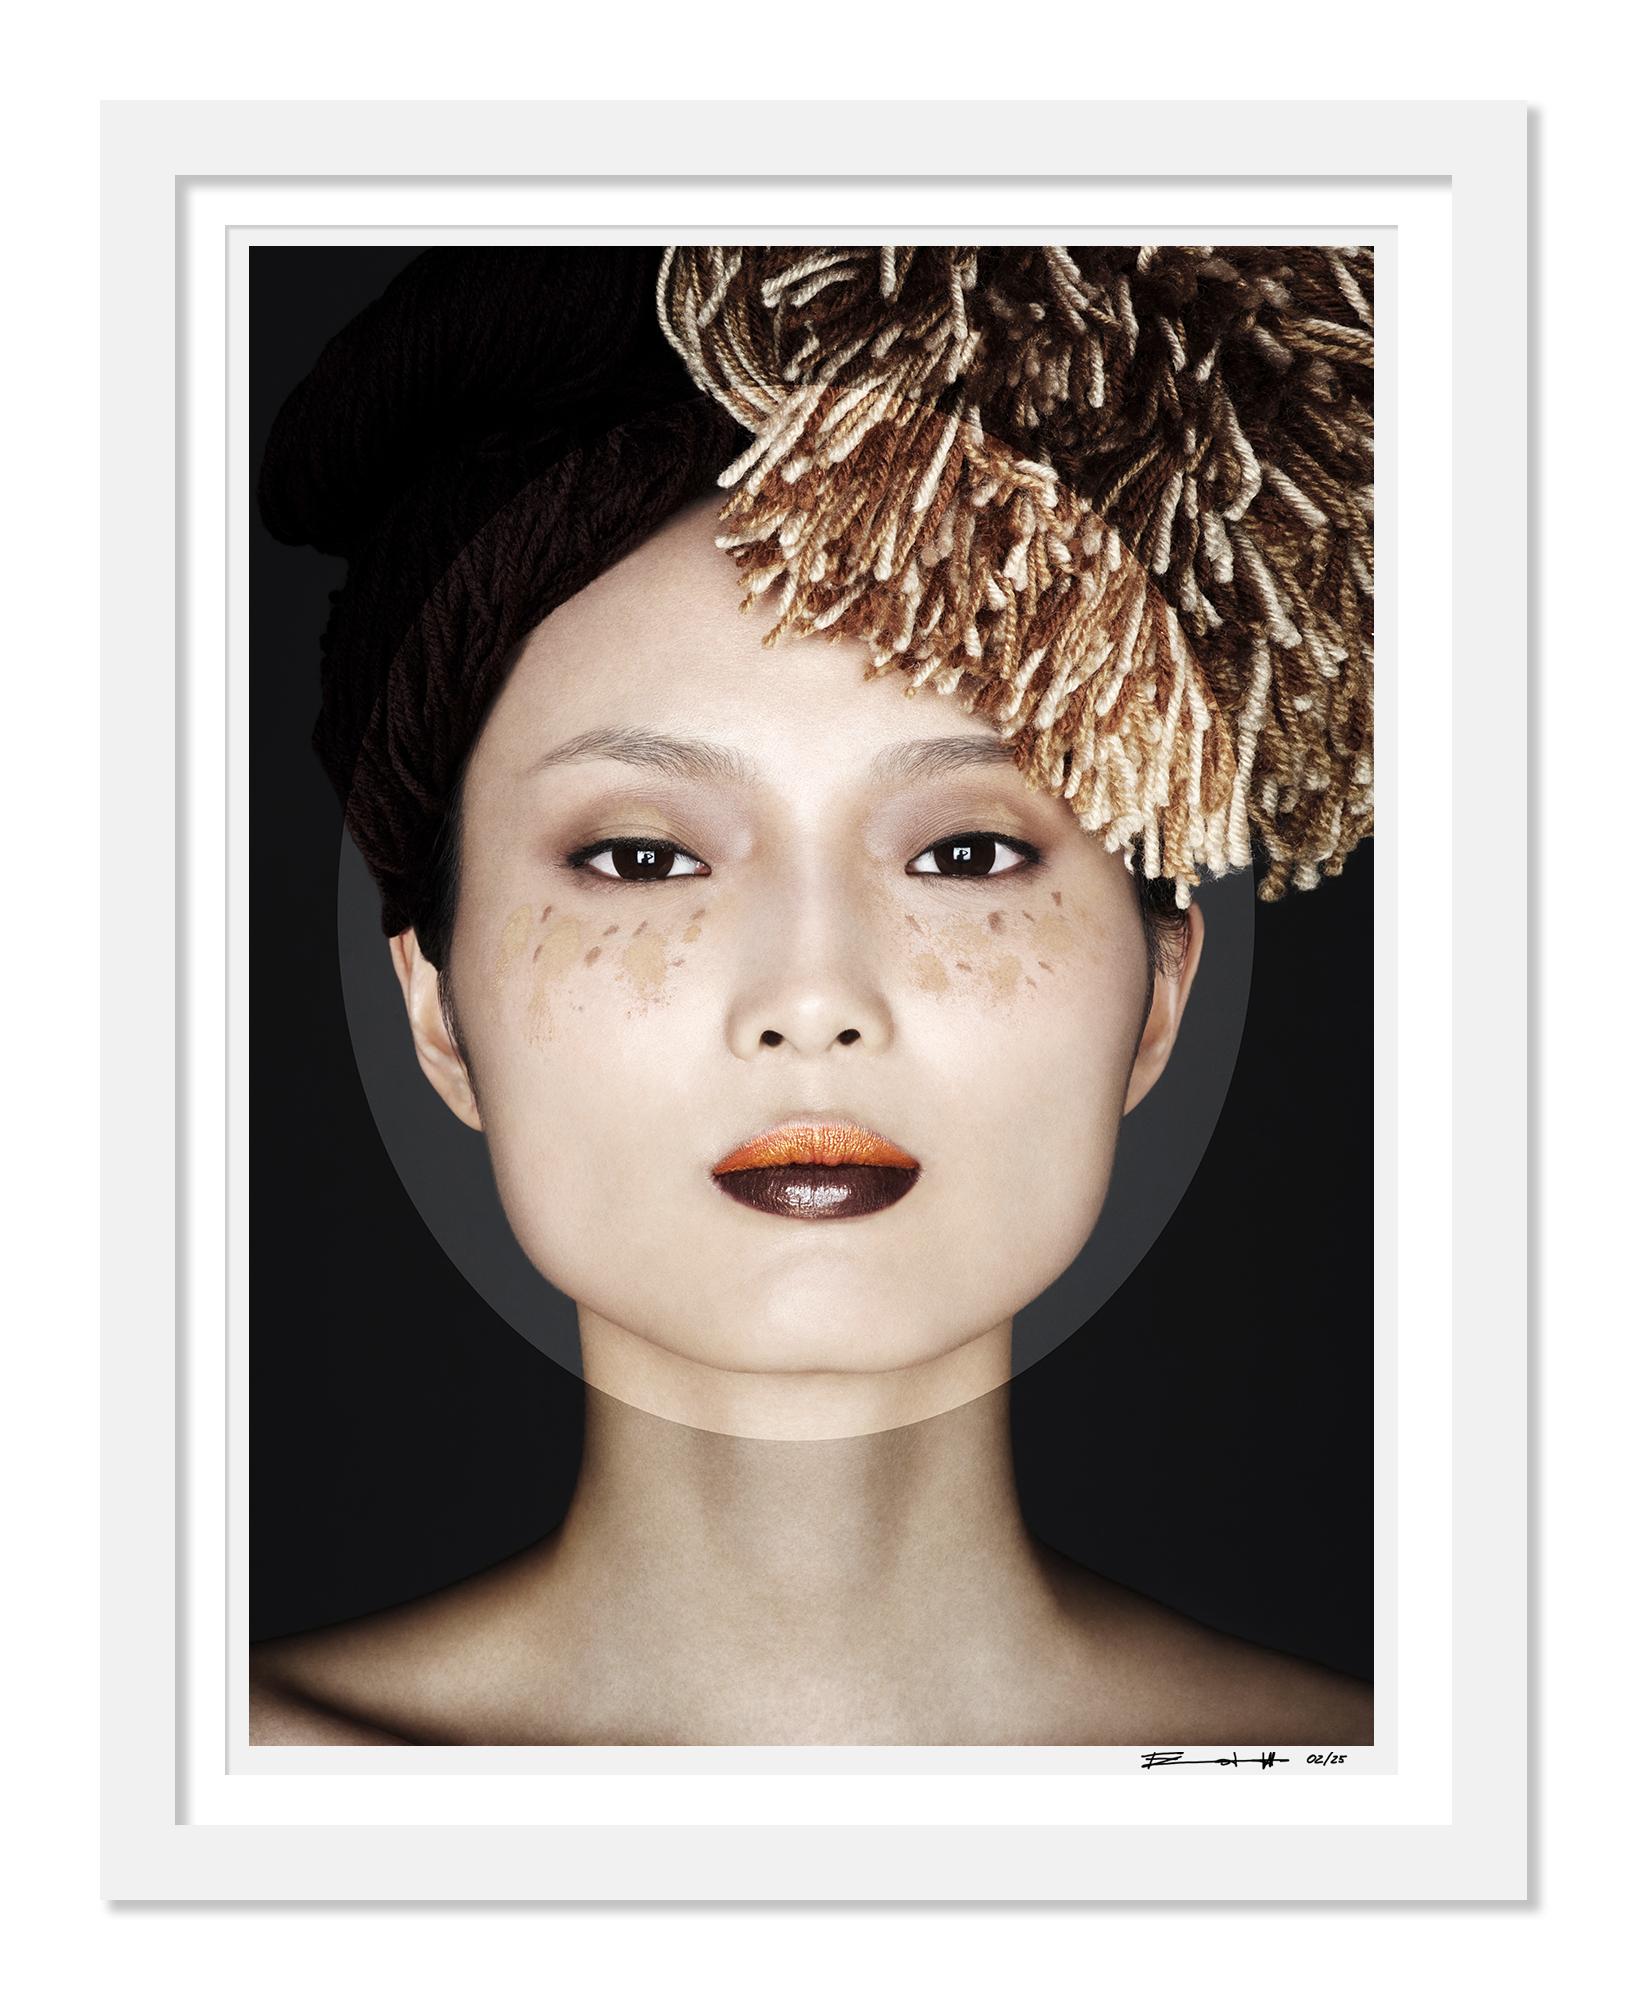 SHAKIRA BEAUTY KUNMING limited edition print